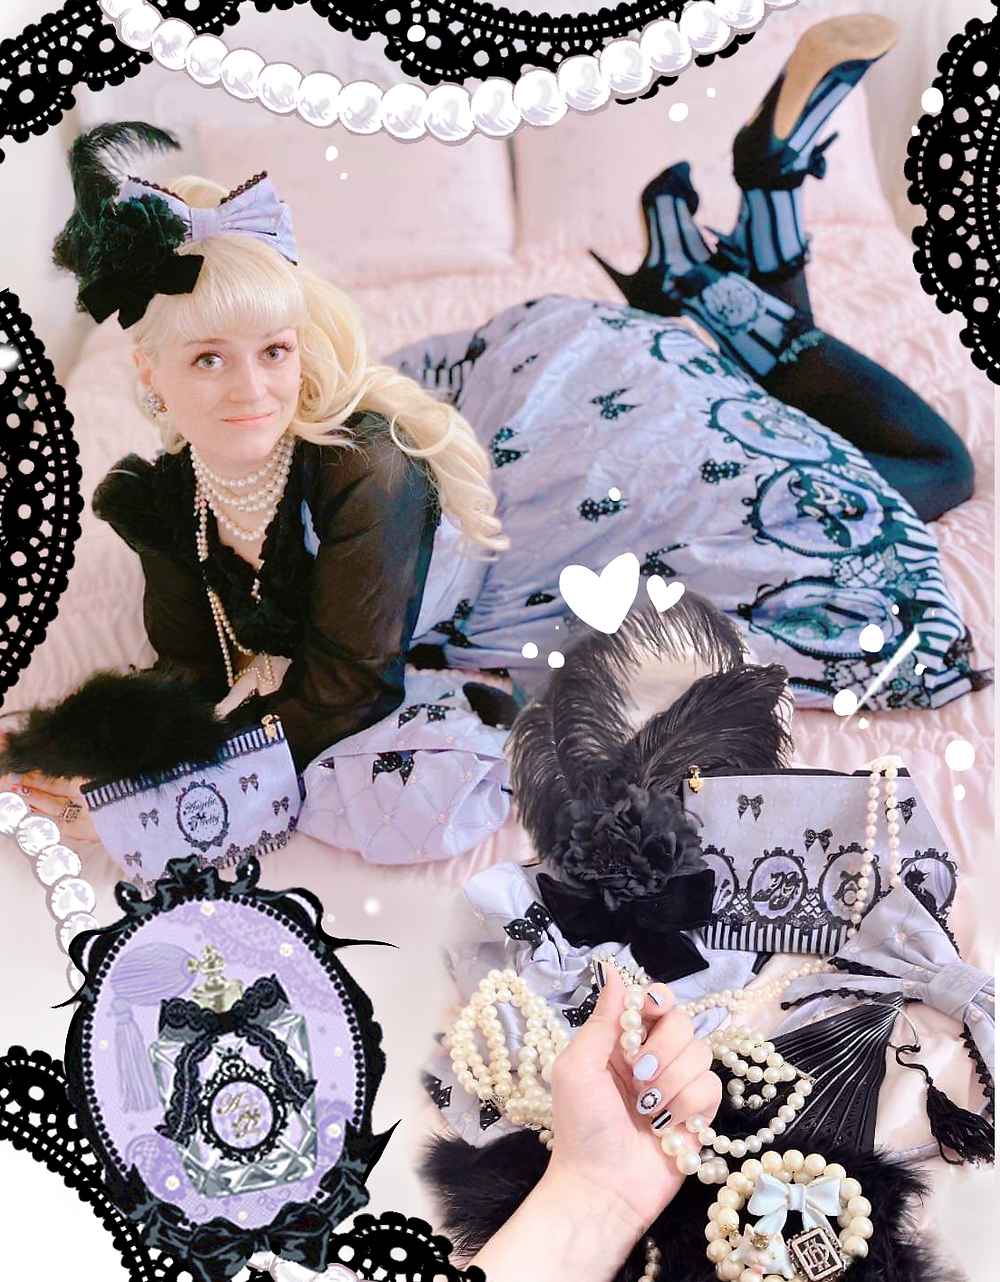 Aini Angelic Pretty Cinema Doll Collage